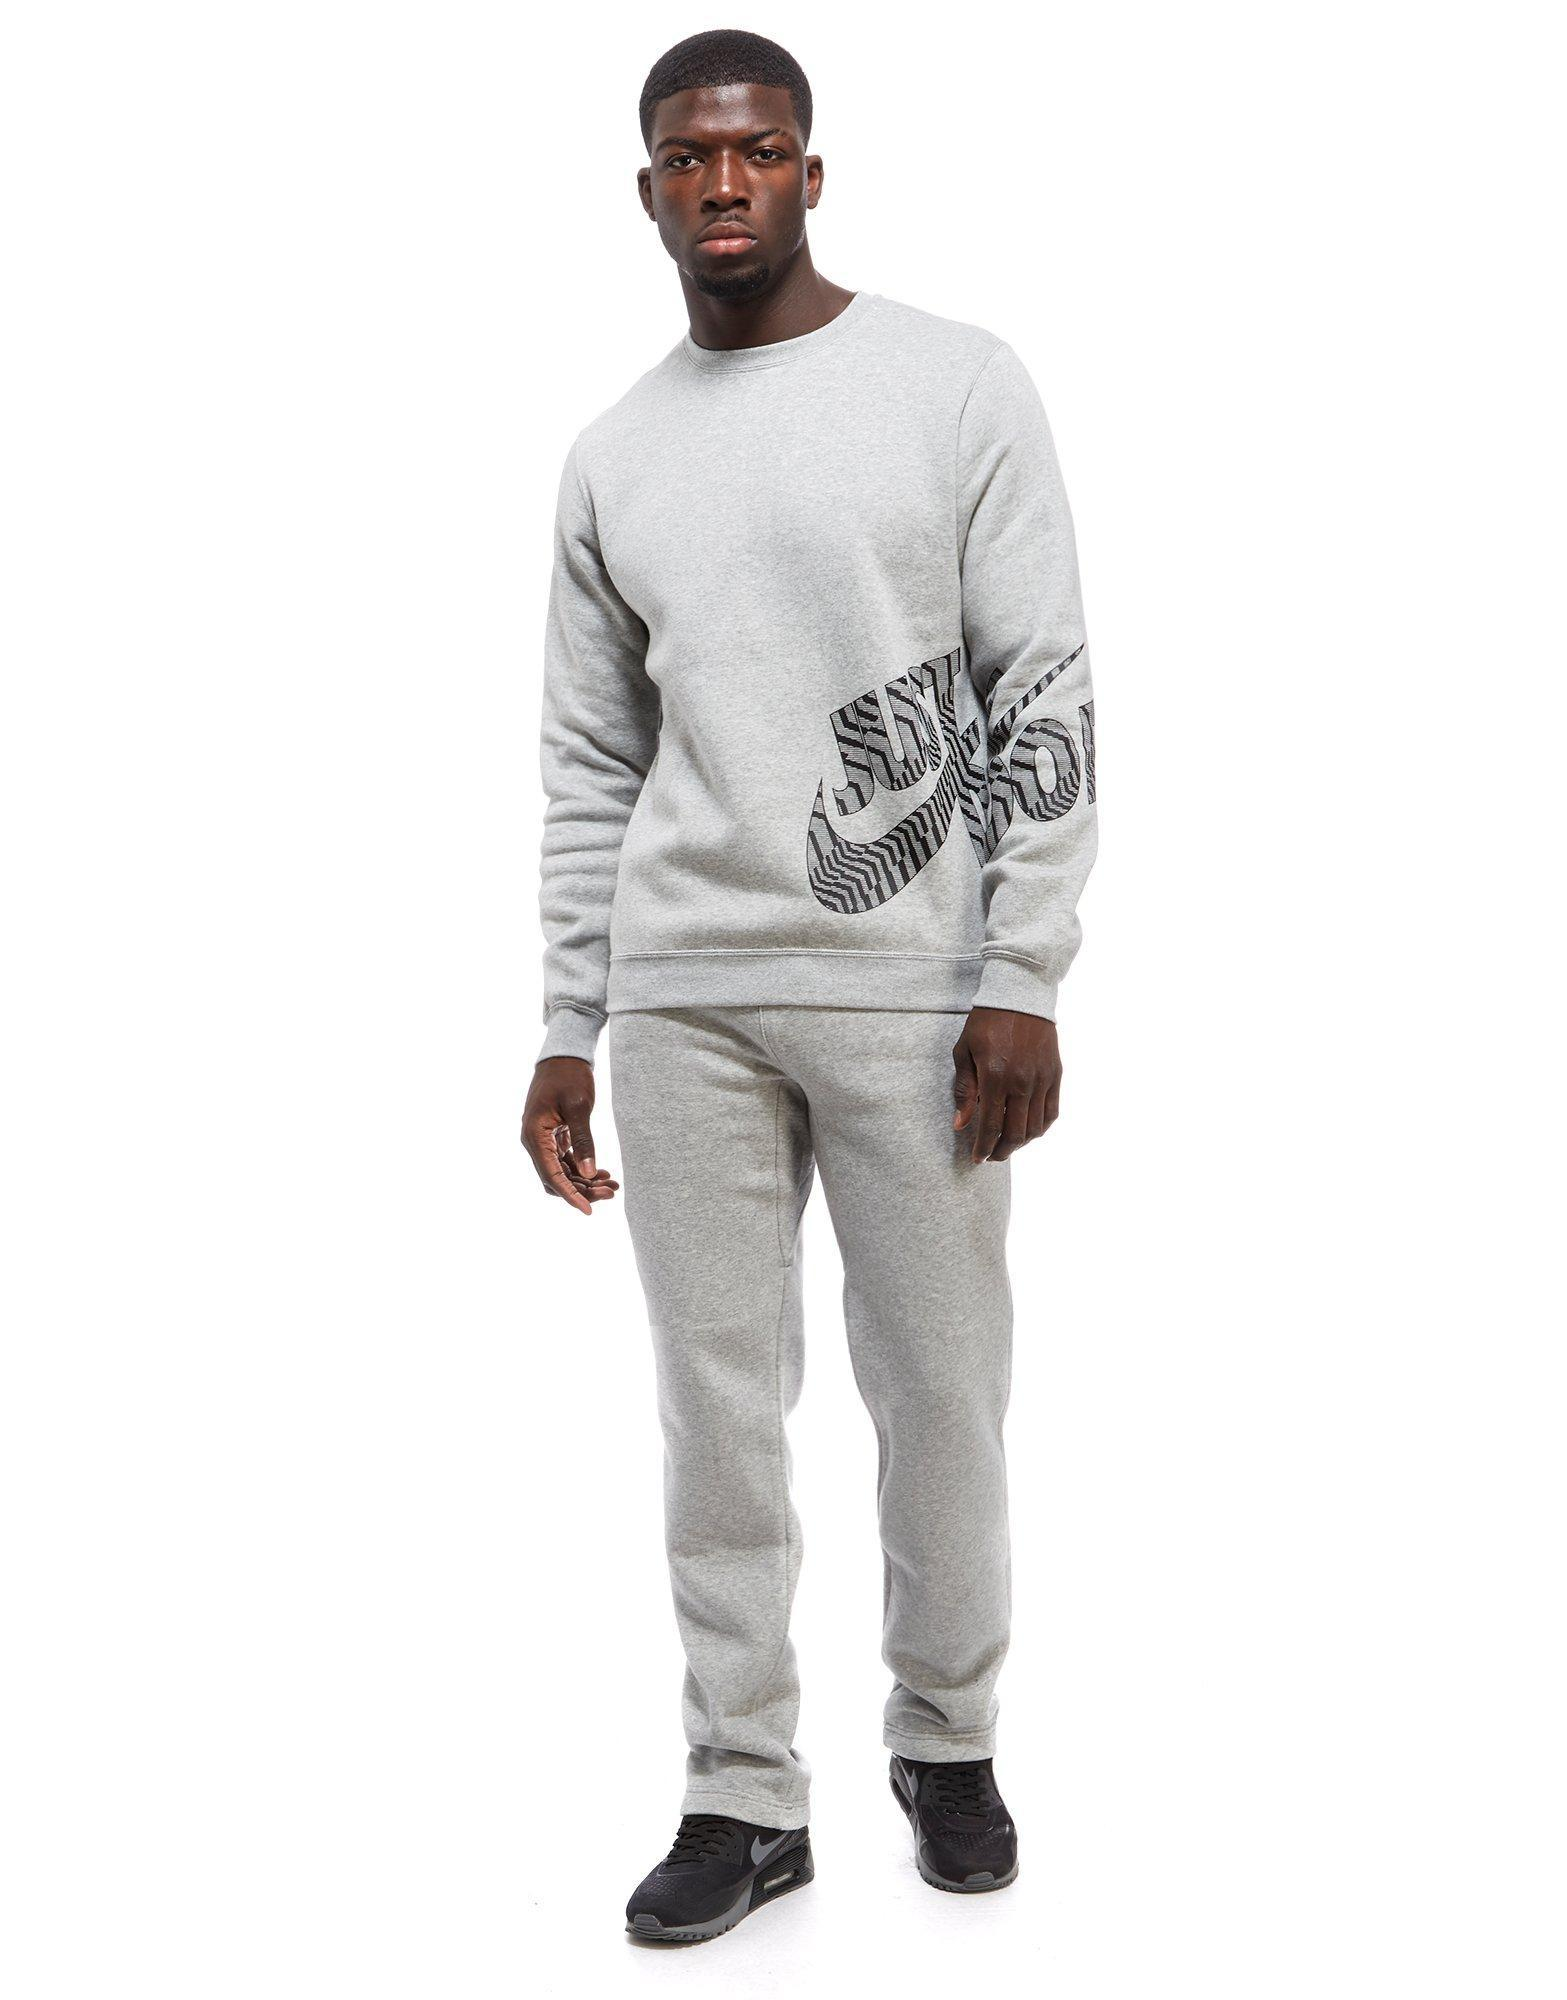 Nike Cotton Just Do It Logo Sweatshirt in Grey/Black (Grey) for Men